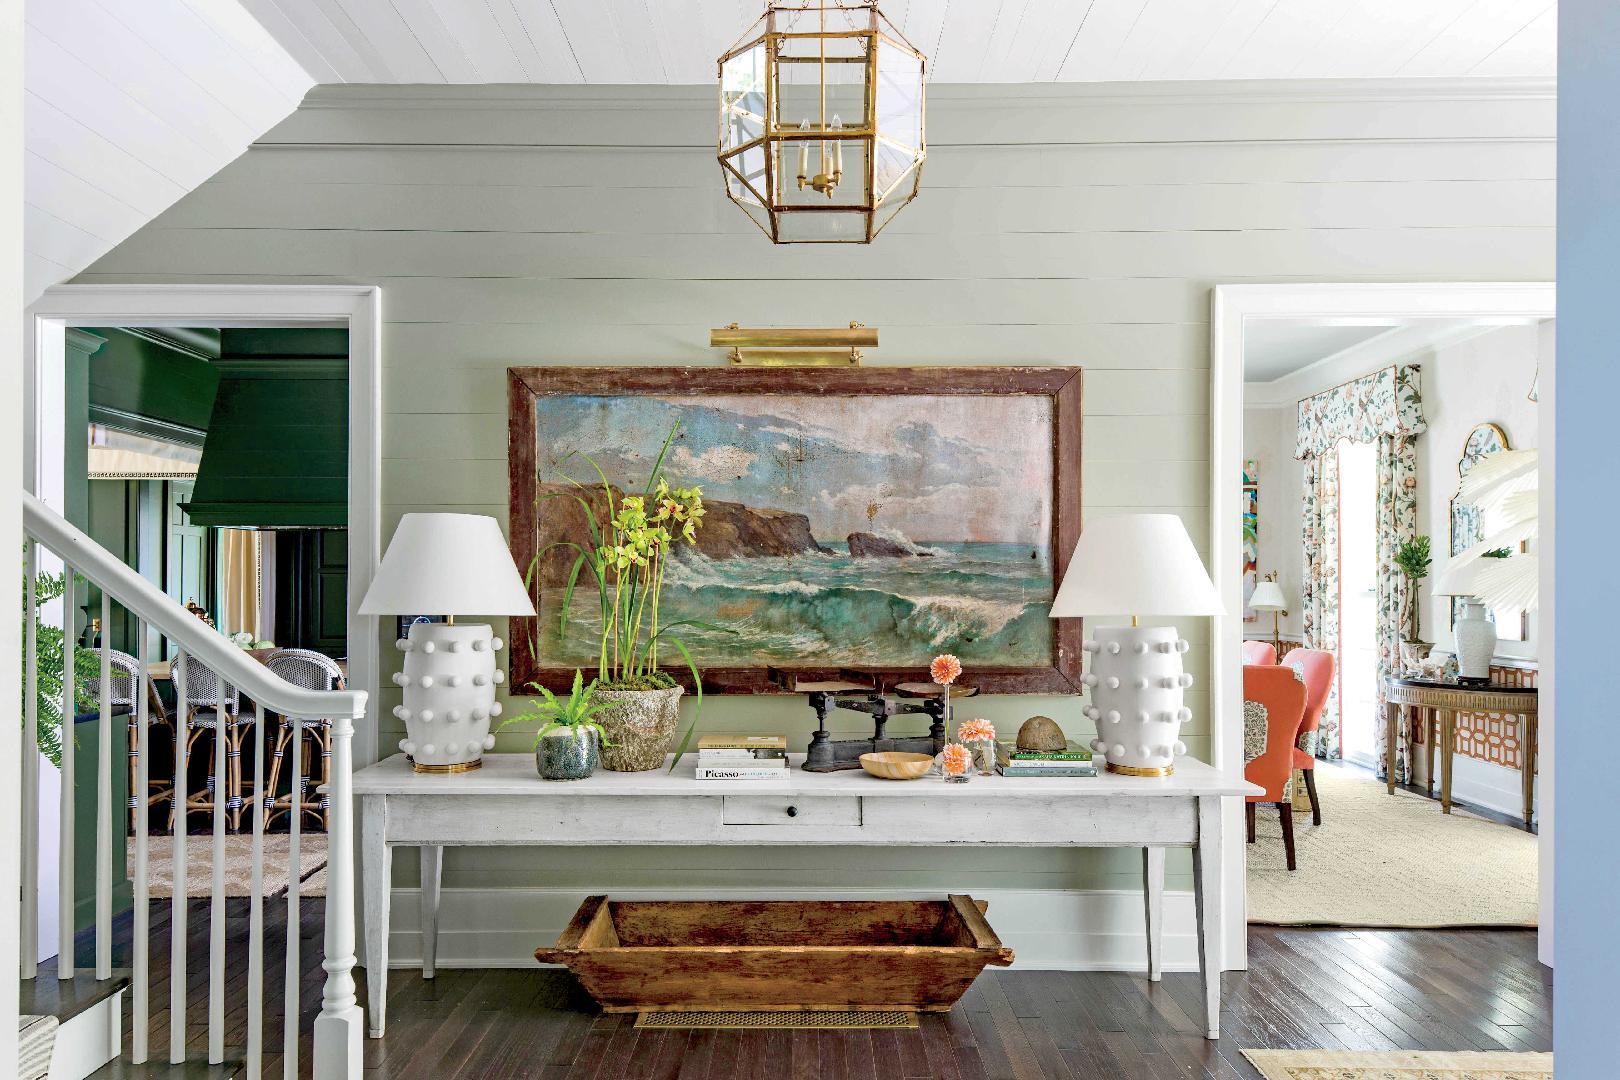 House Idea Design Fresh In Innovative Ideas 3 | Vefday.me